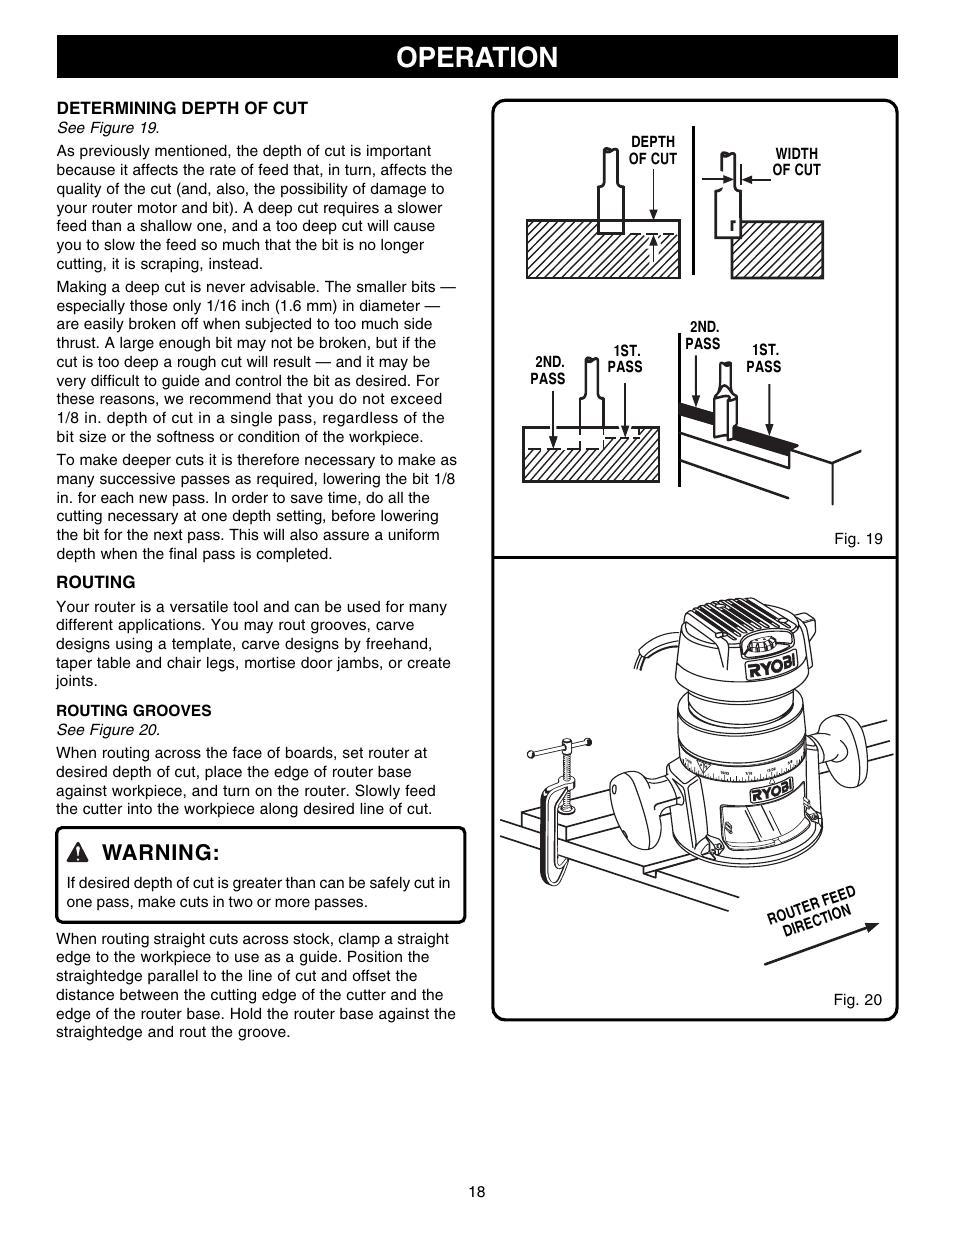 Operation, warning | ryobi r181fb1 user manual | page 18 / 24.